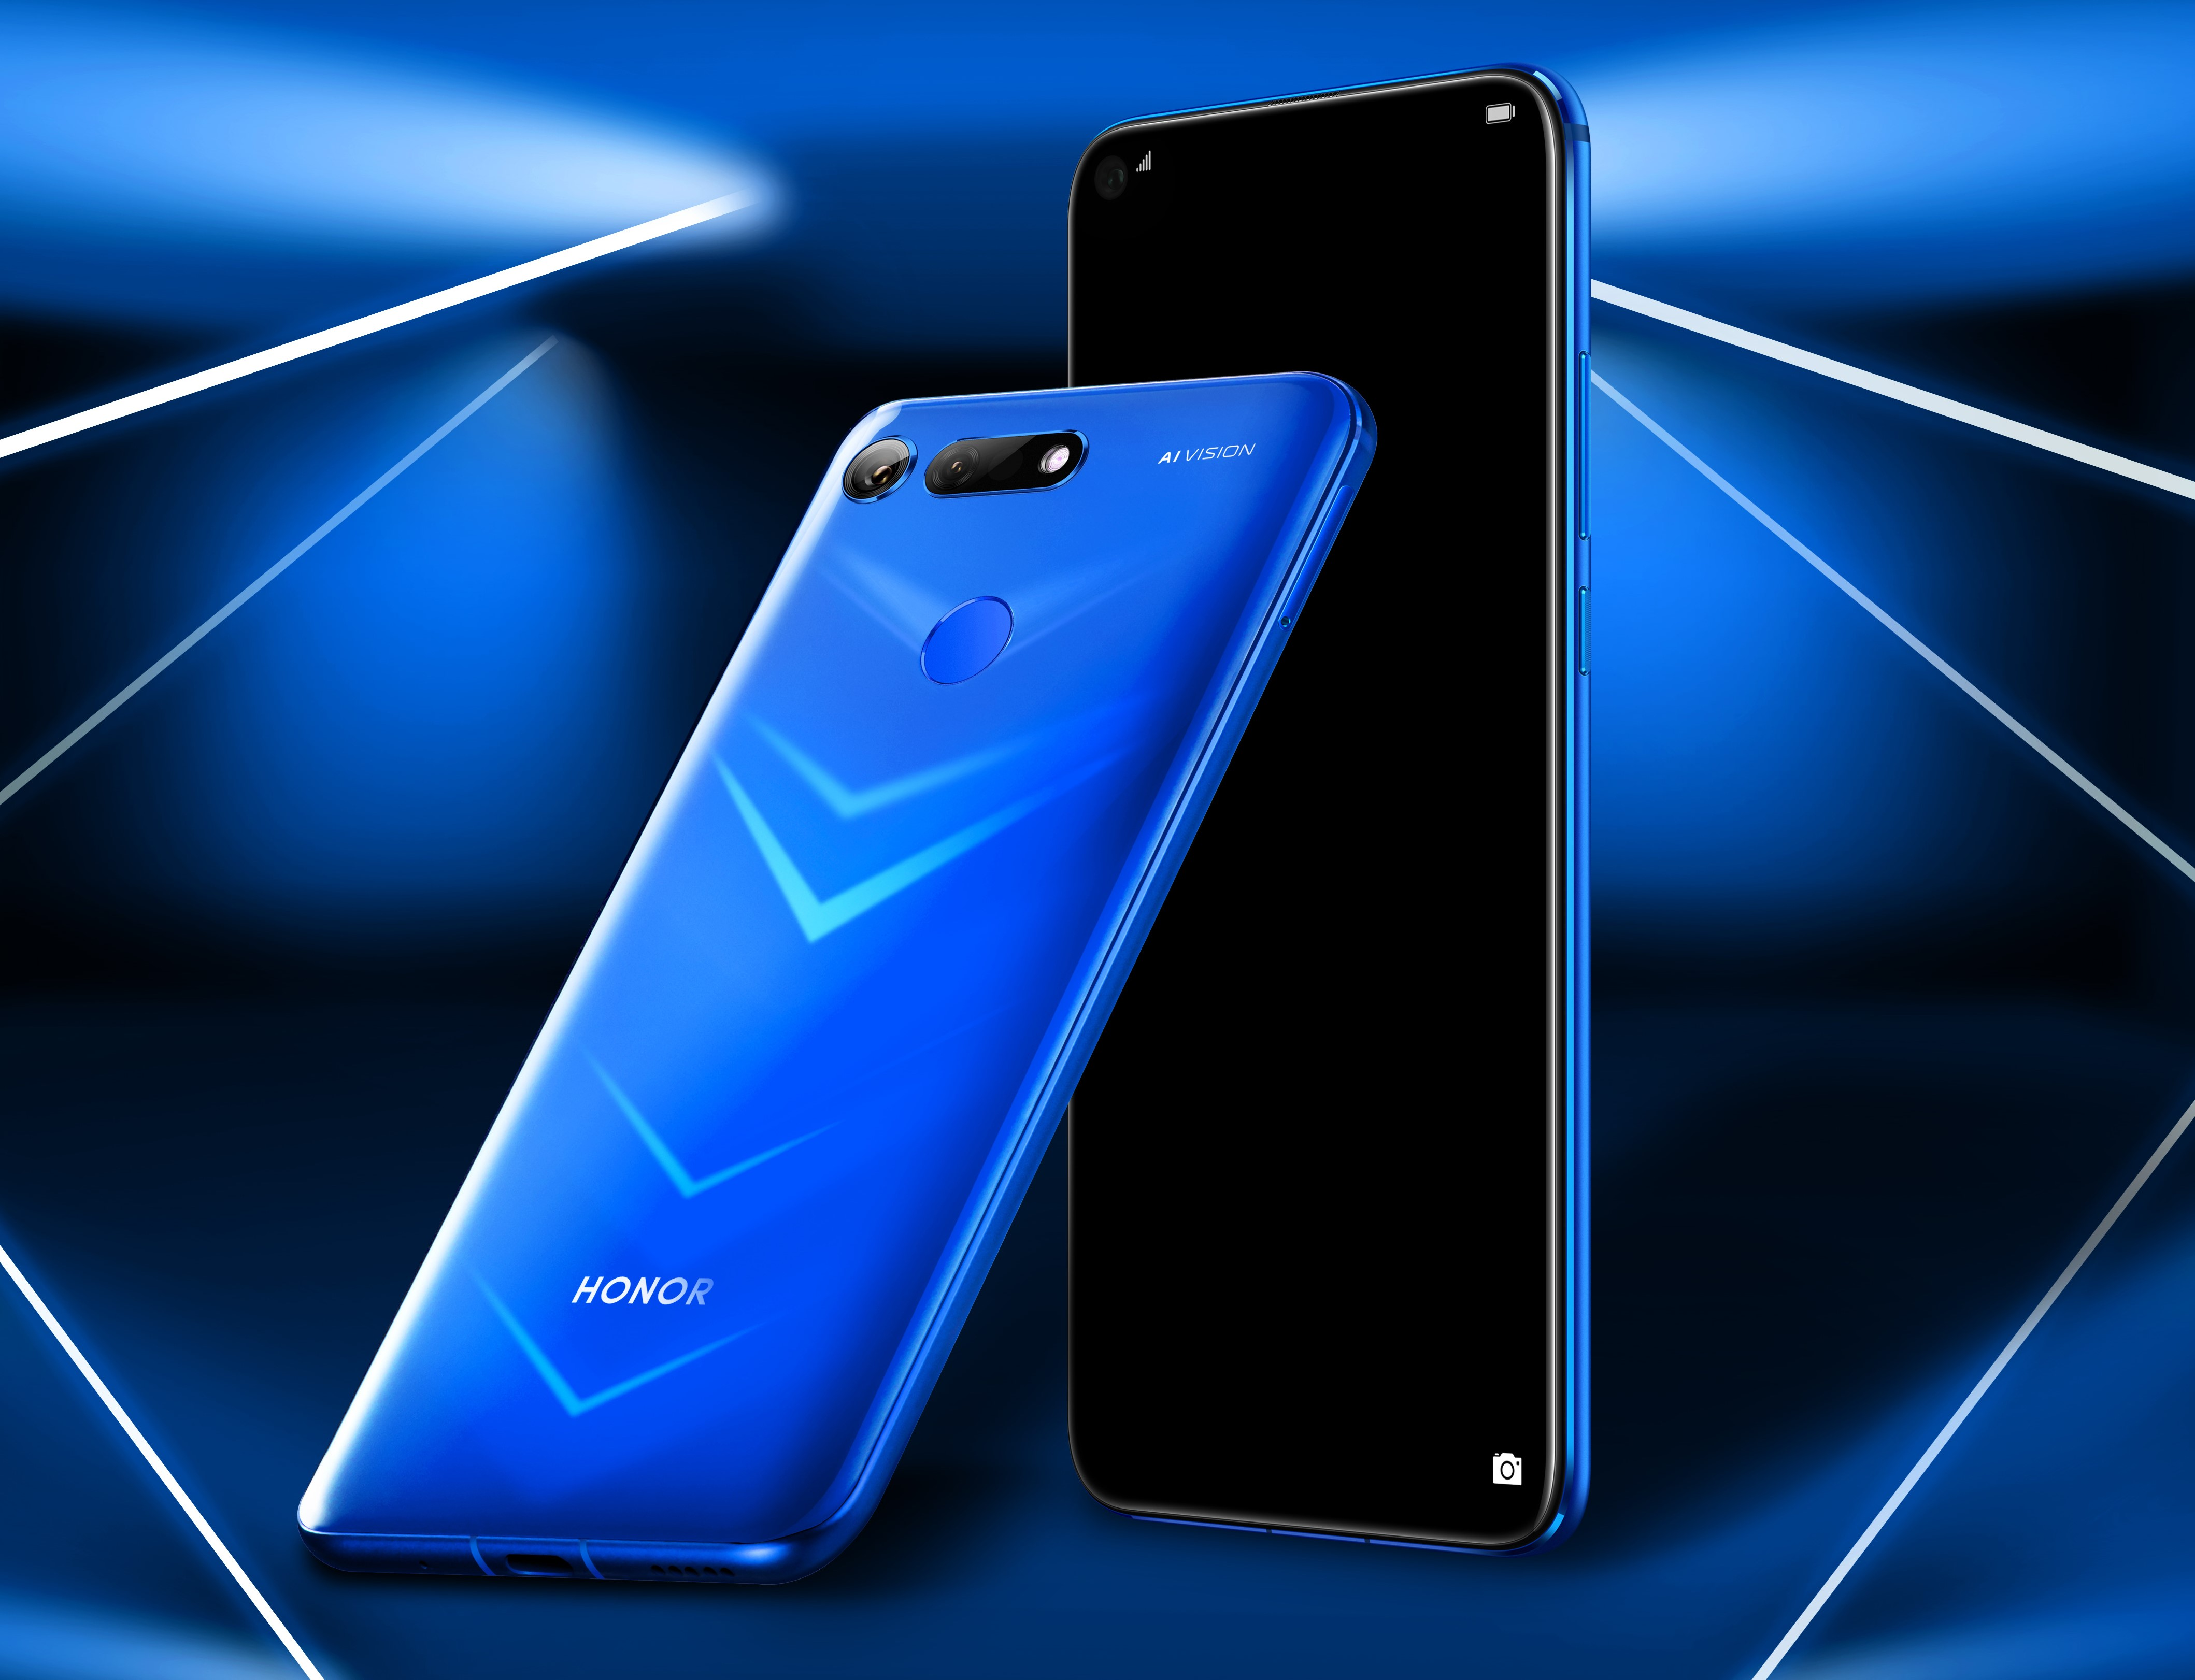 Huawei e HONOR annunciano i nuovi obiettivi strategici thumbnail